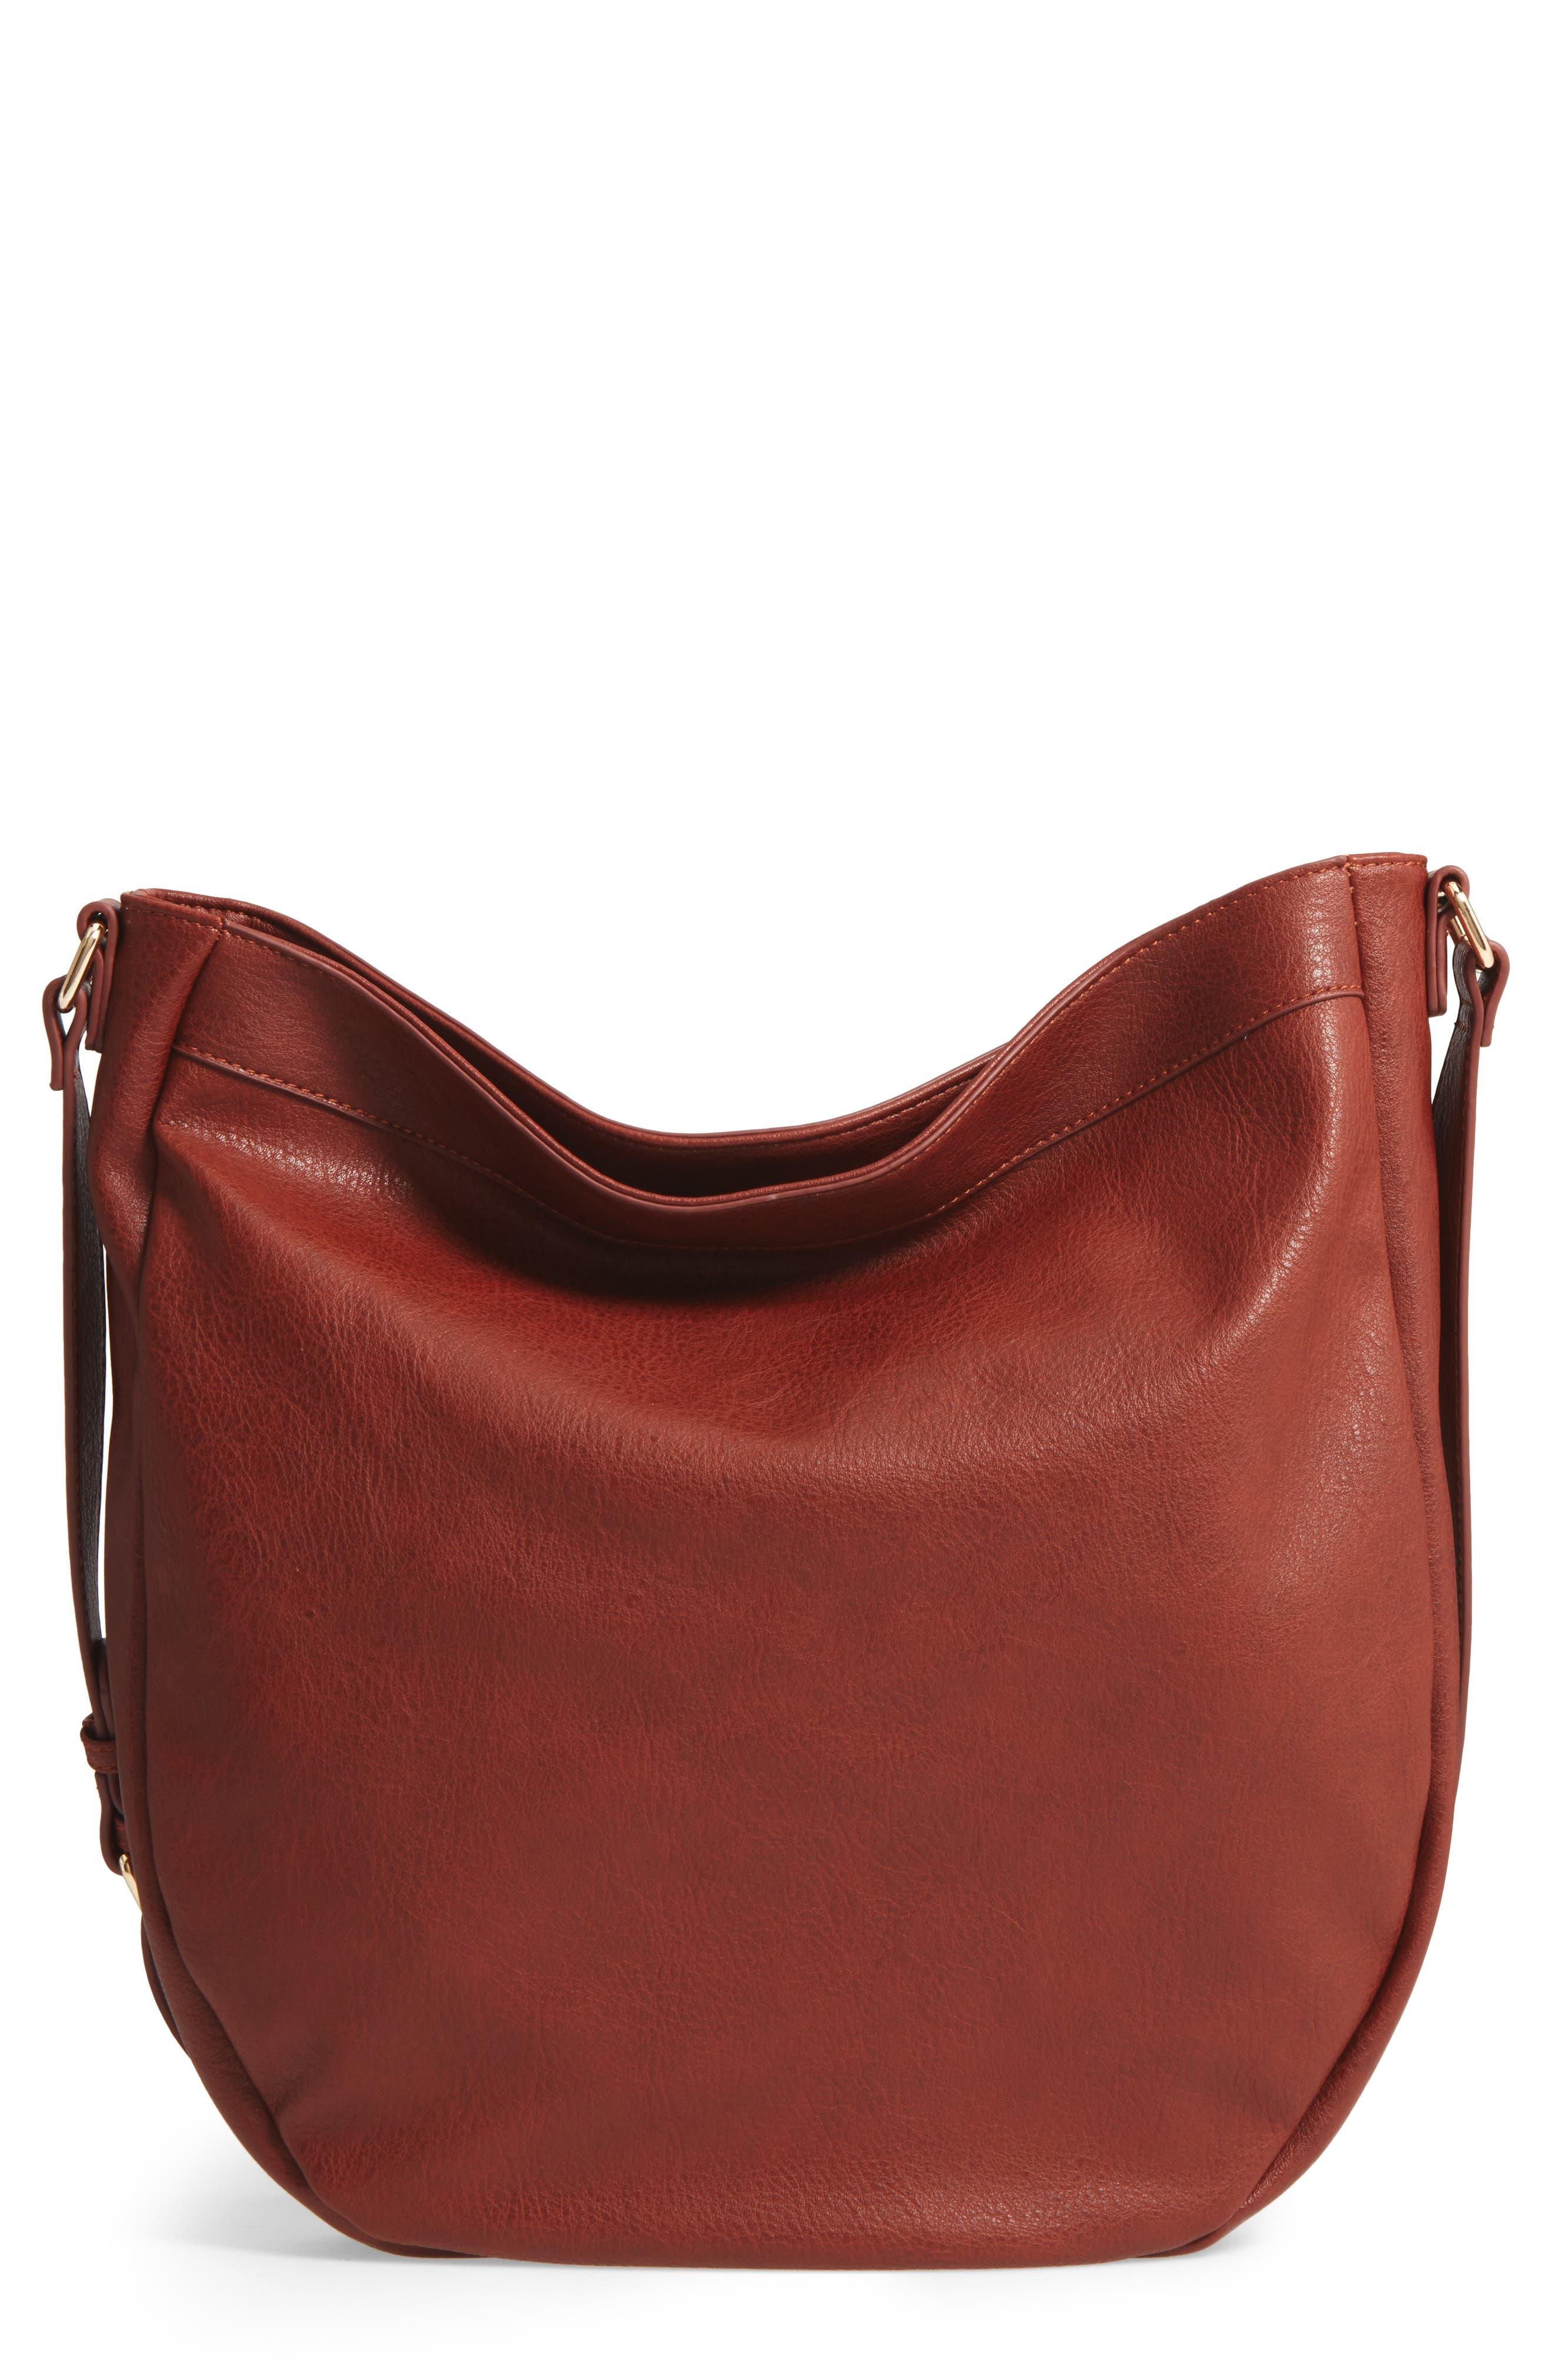 Kadence Faux Leather Shoulder Bag,                             Main thumbnail 2, color,